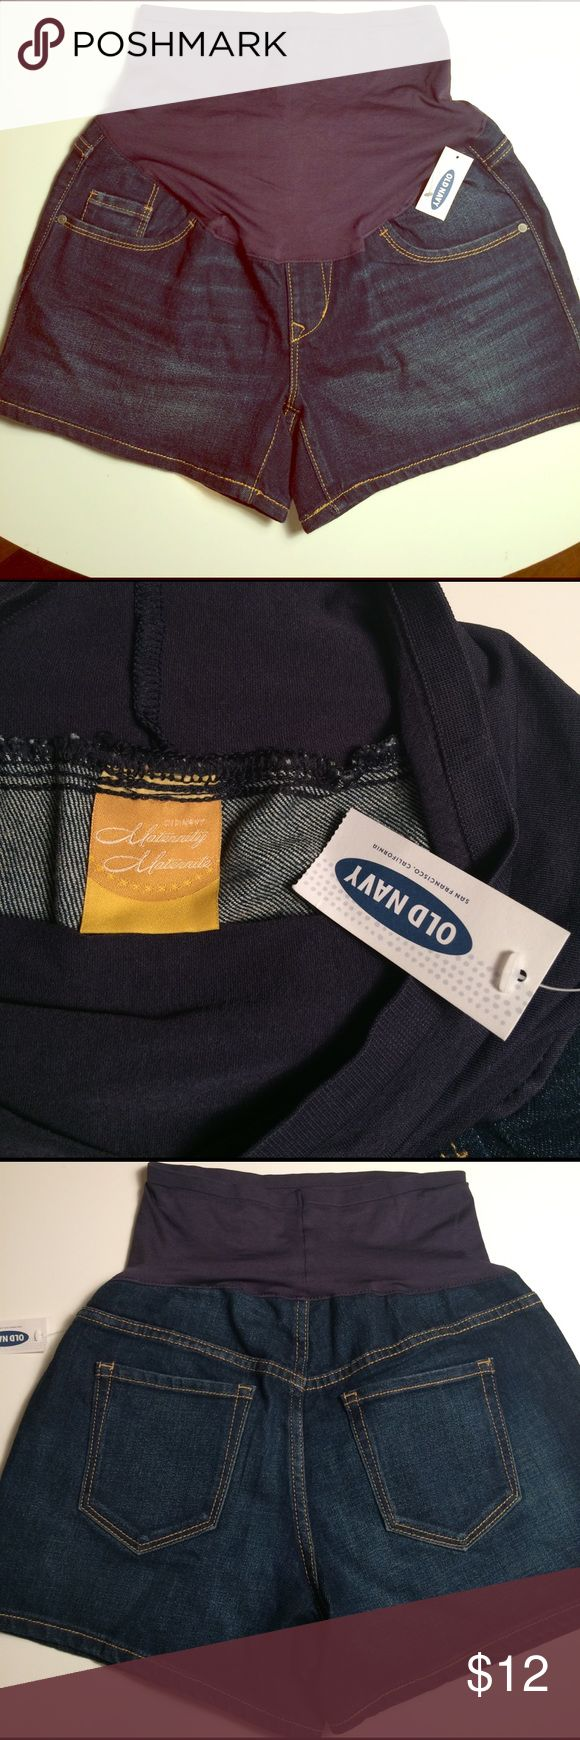 "Old Navy maternity shorts size 4 NWT New with tags Old Navy size 4 maternity shorts. Inseam 4"". Old Navy Shorts Jean Shorts"